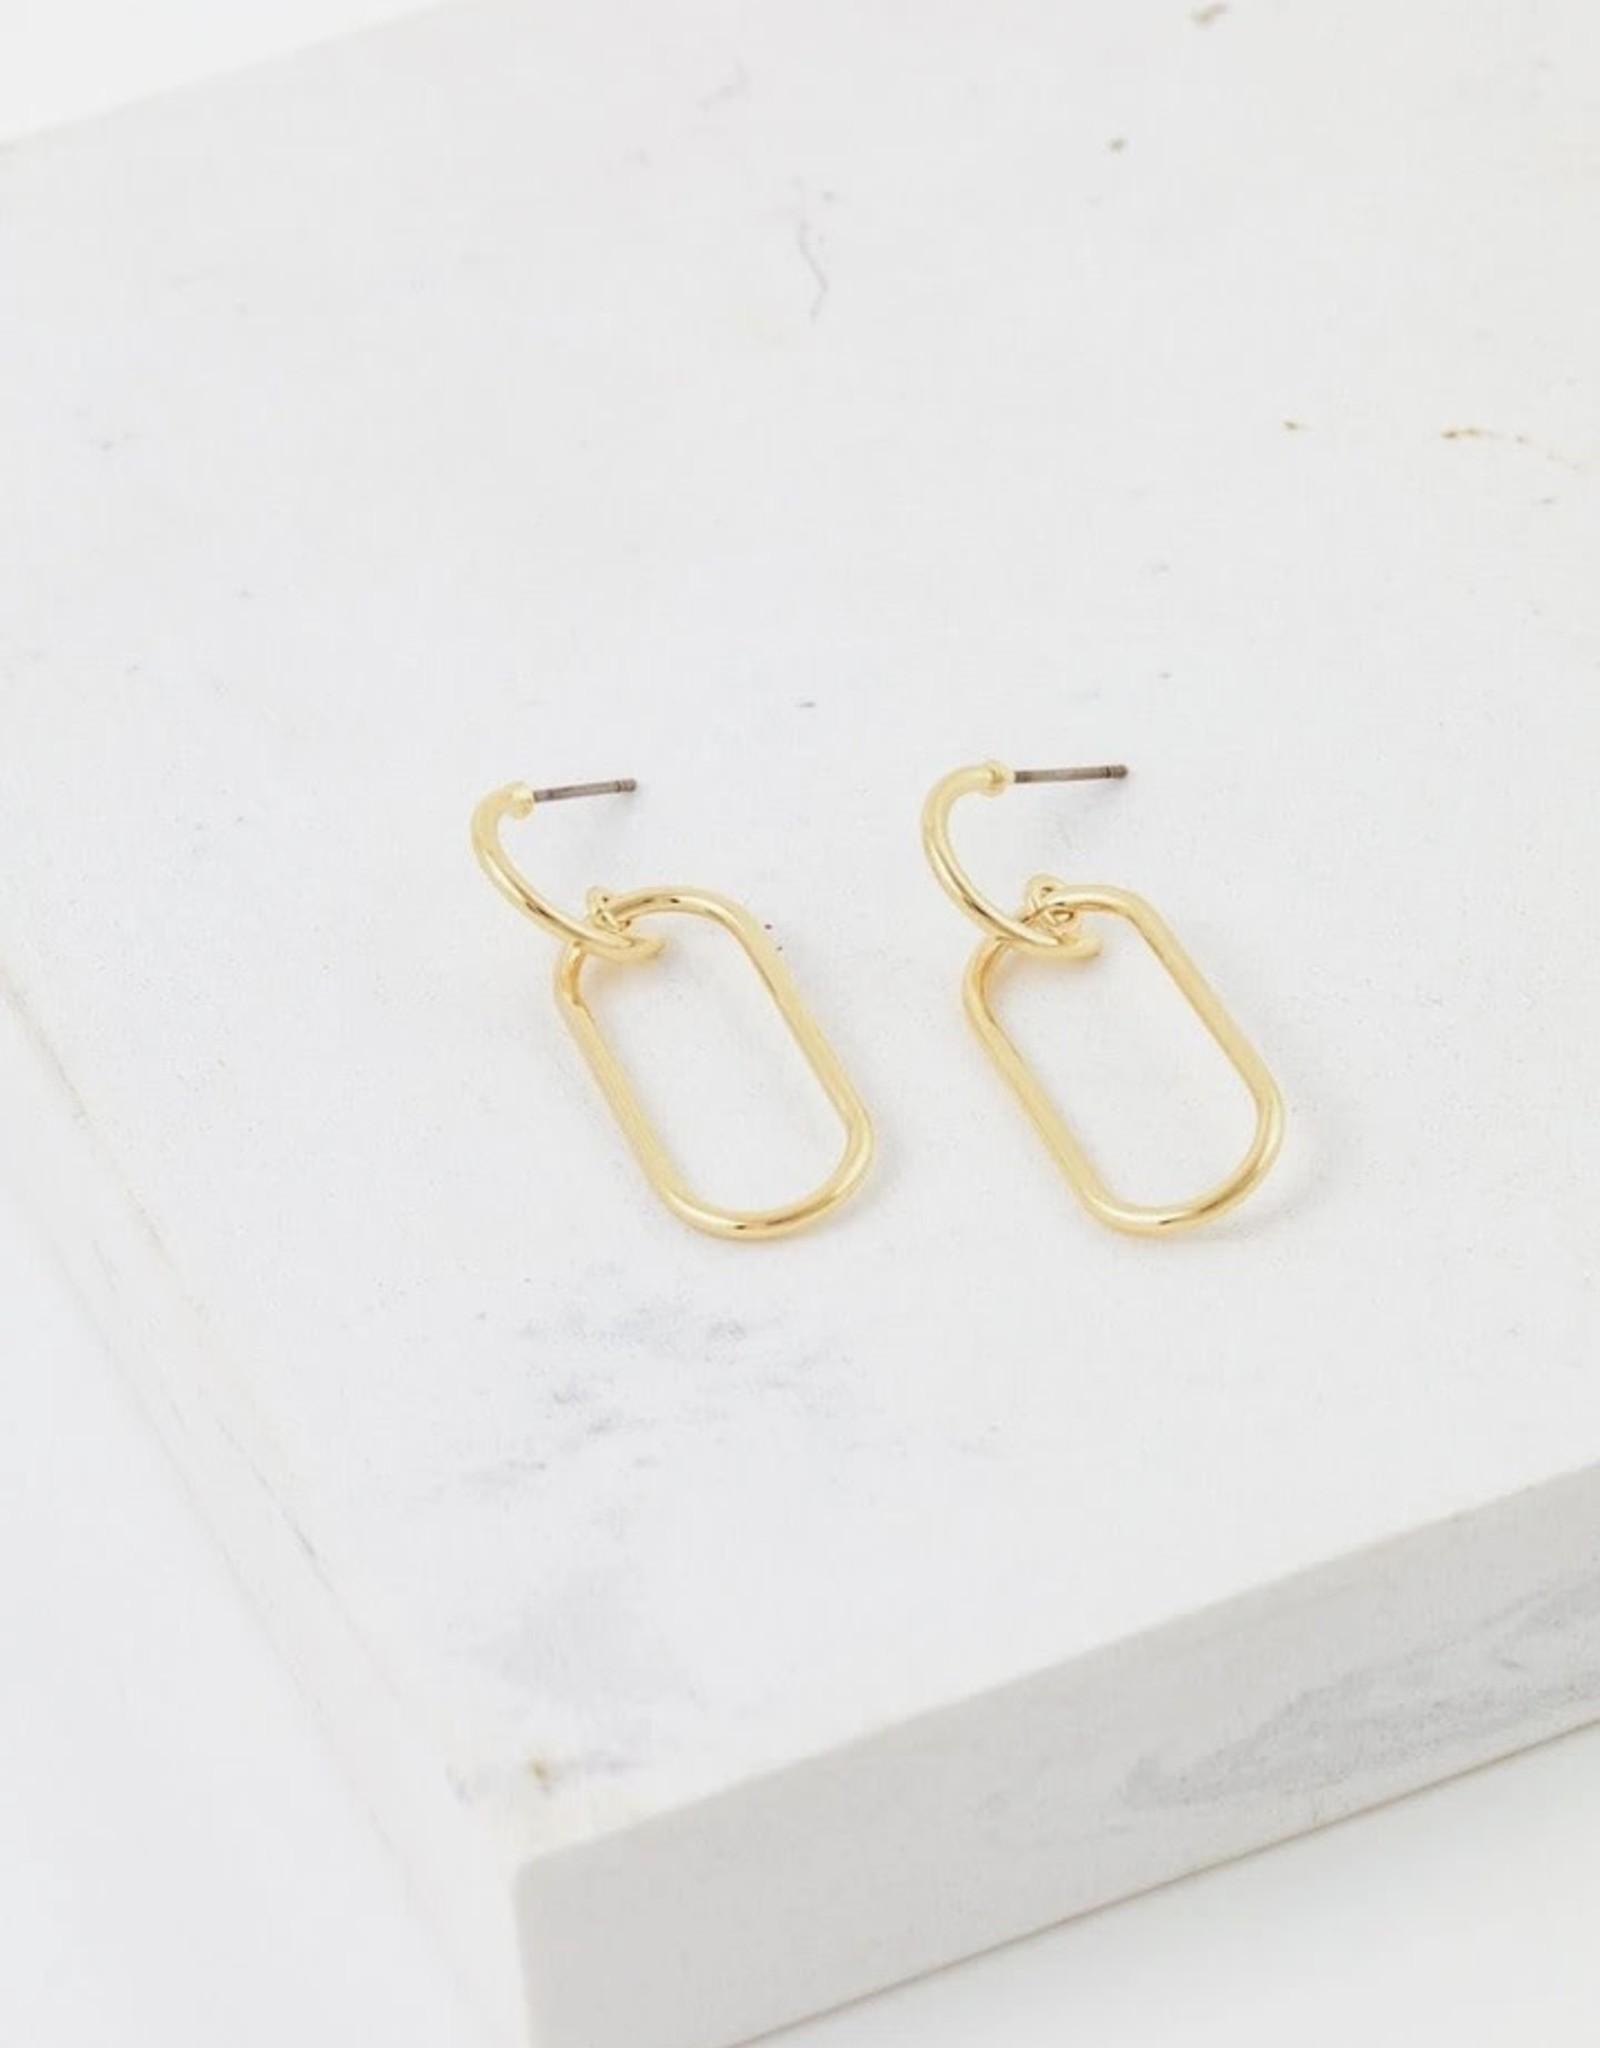 Earrings, Lago Drop, Gold plated brass, Sterling Silver Posts, Gold/Silver-Plated Brass